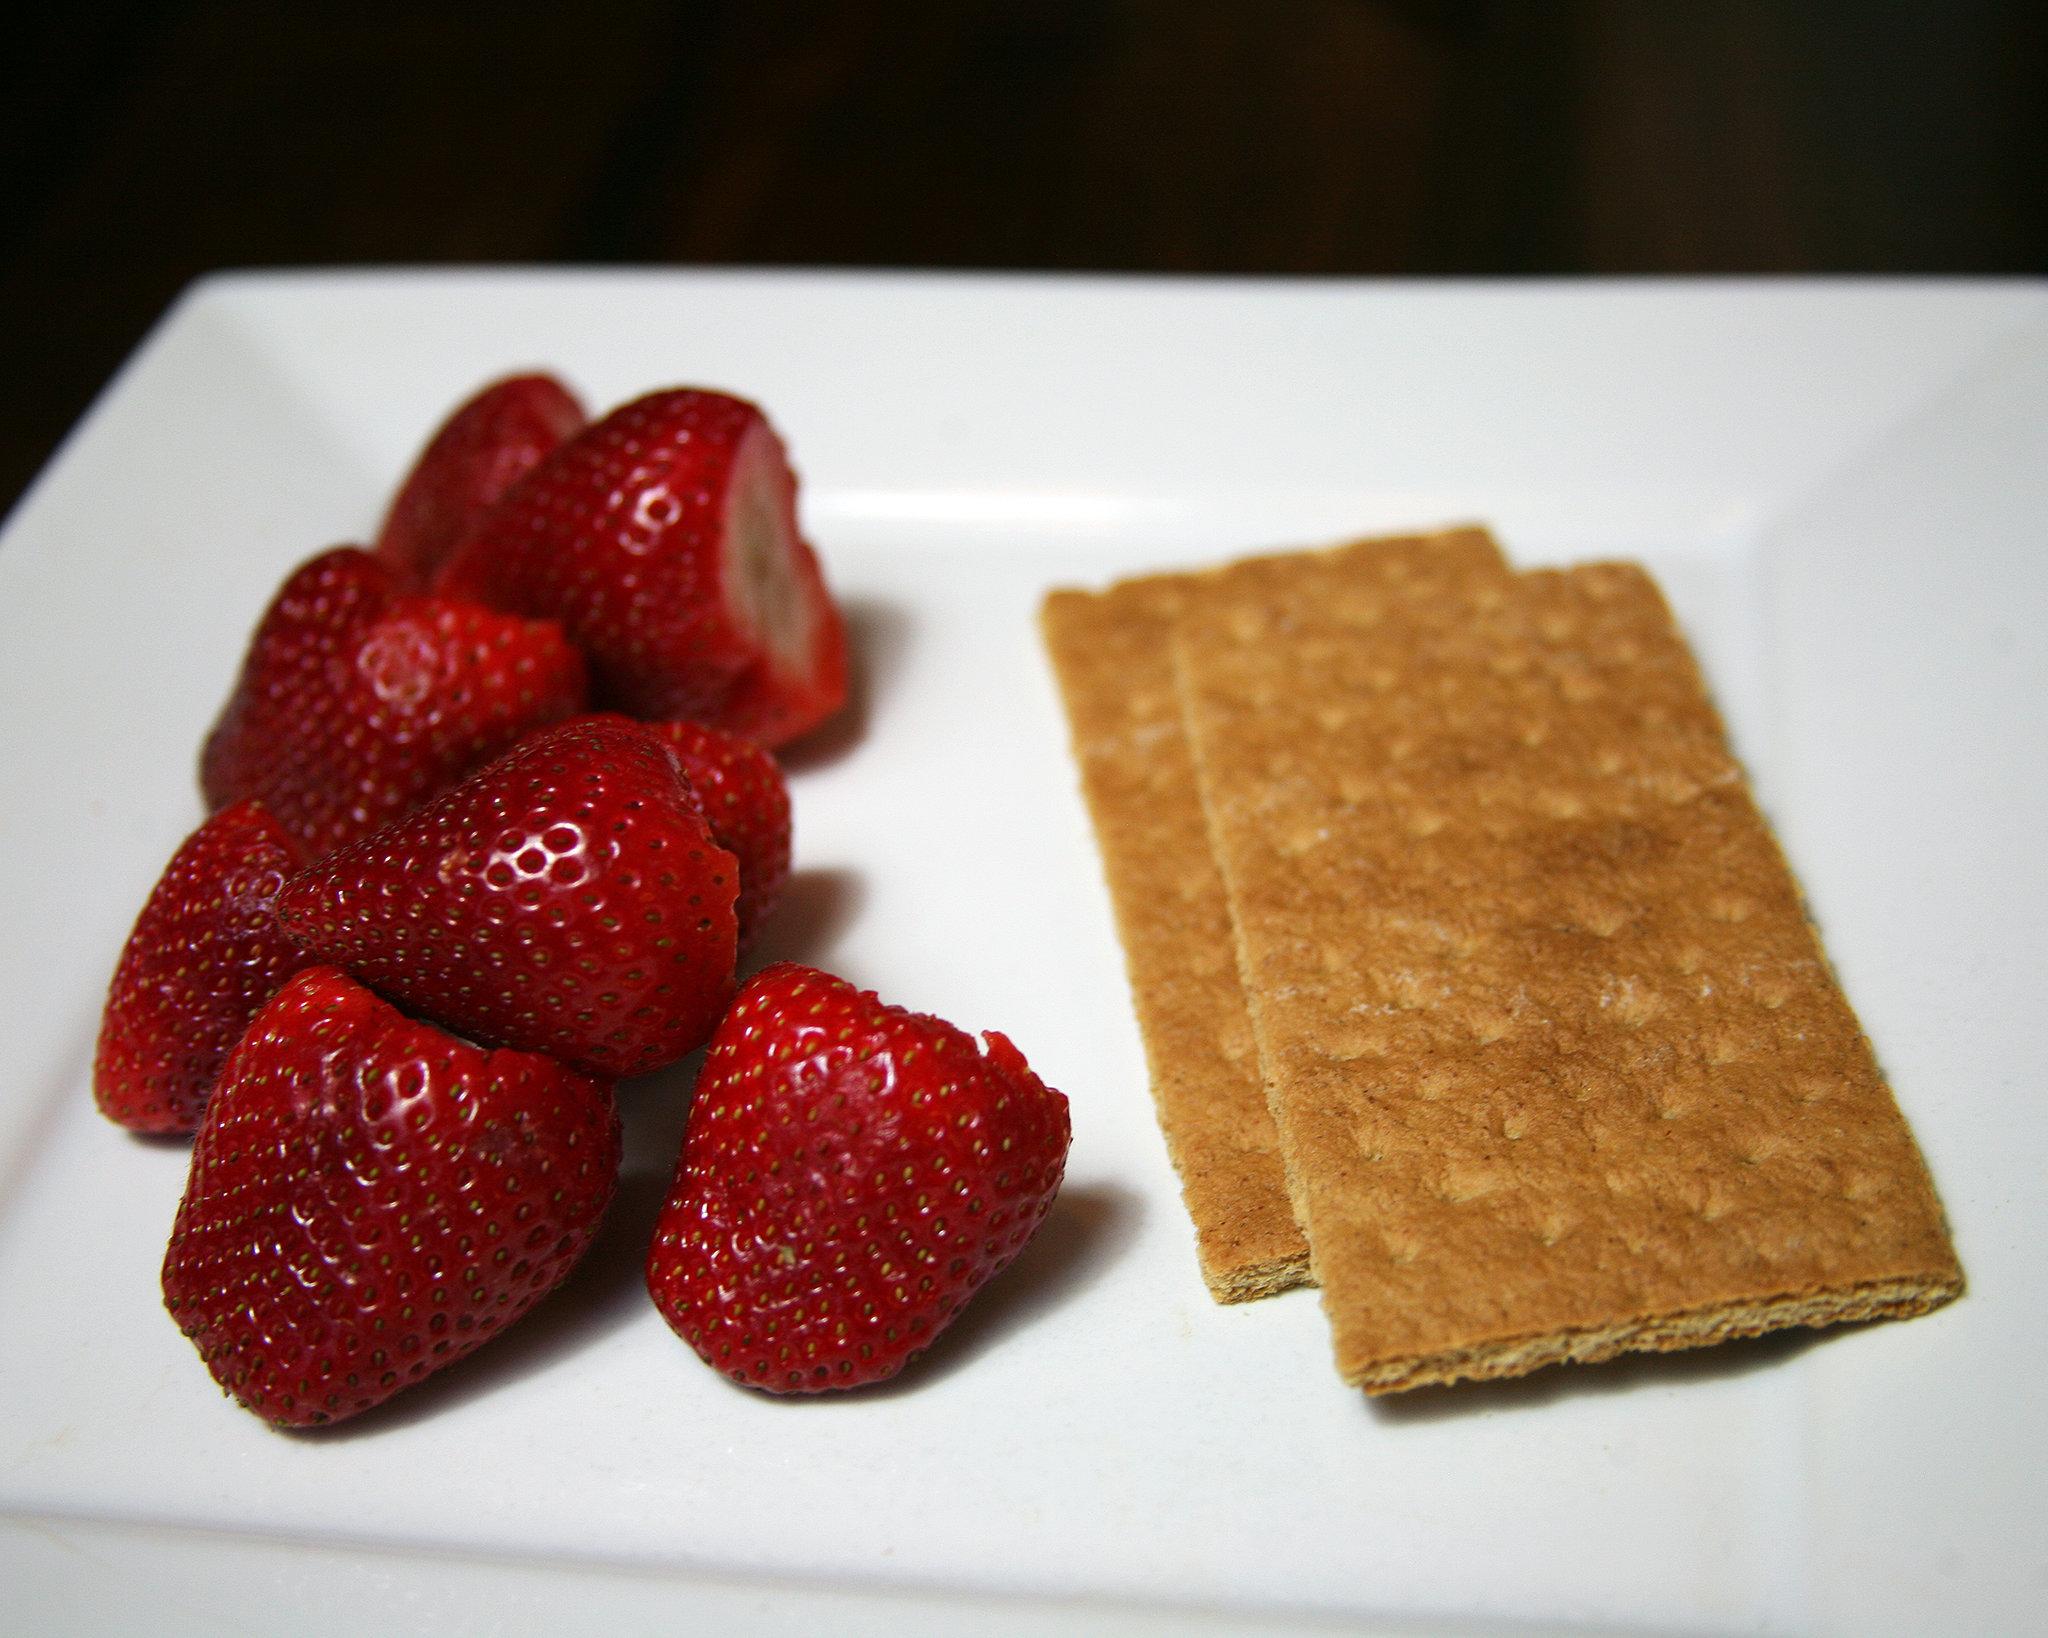 Strawberries and Graham Crackers